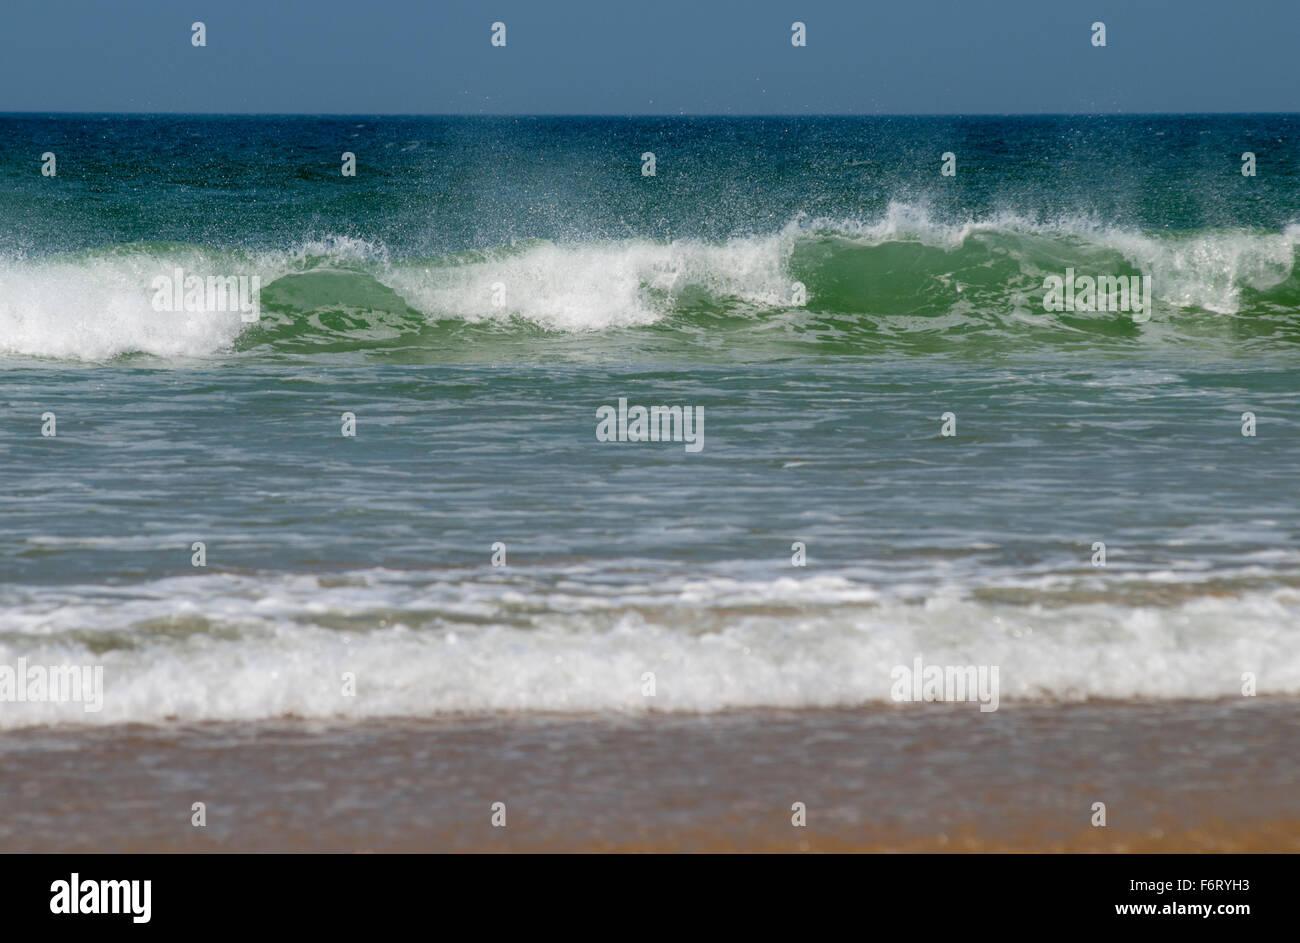 Waves crashing onto a beach in Cornwall, England, UK - Stock Image